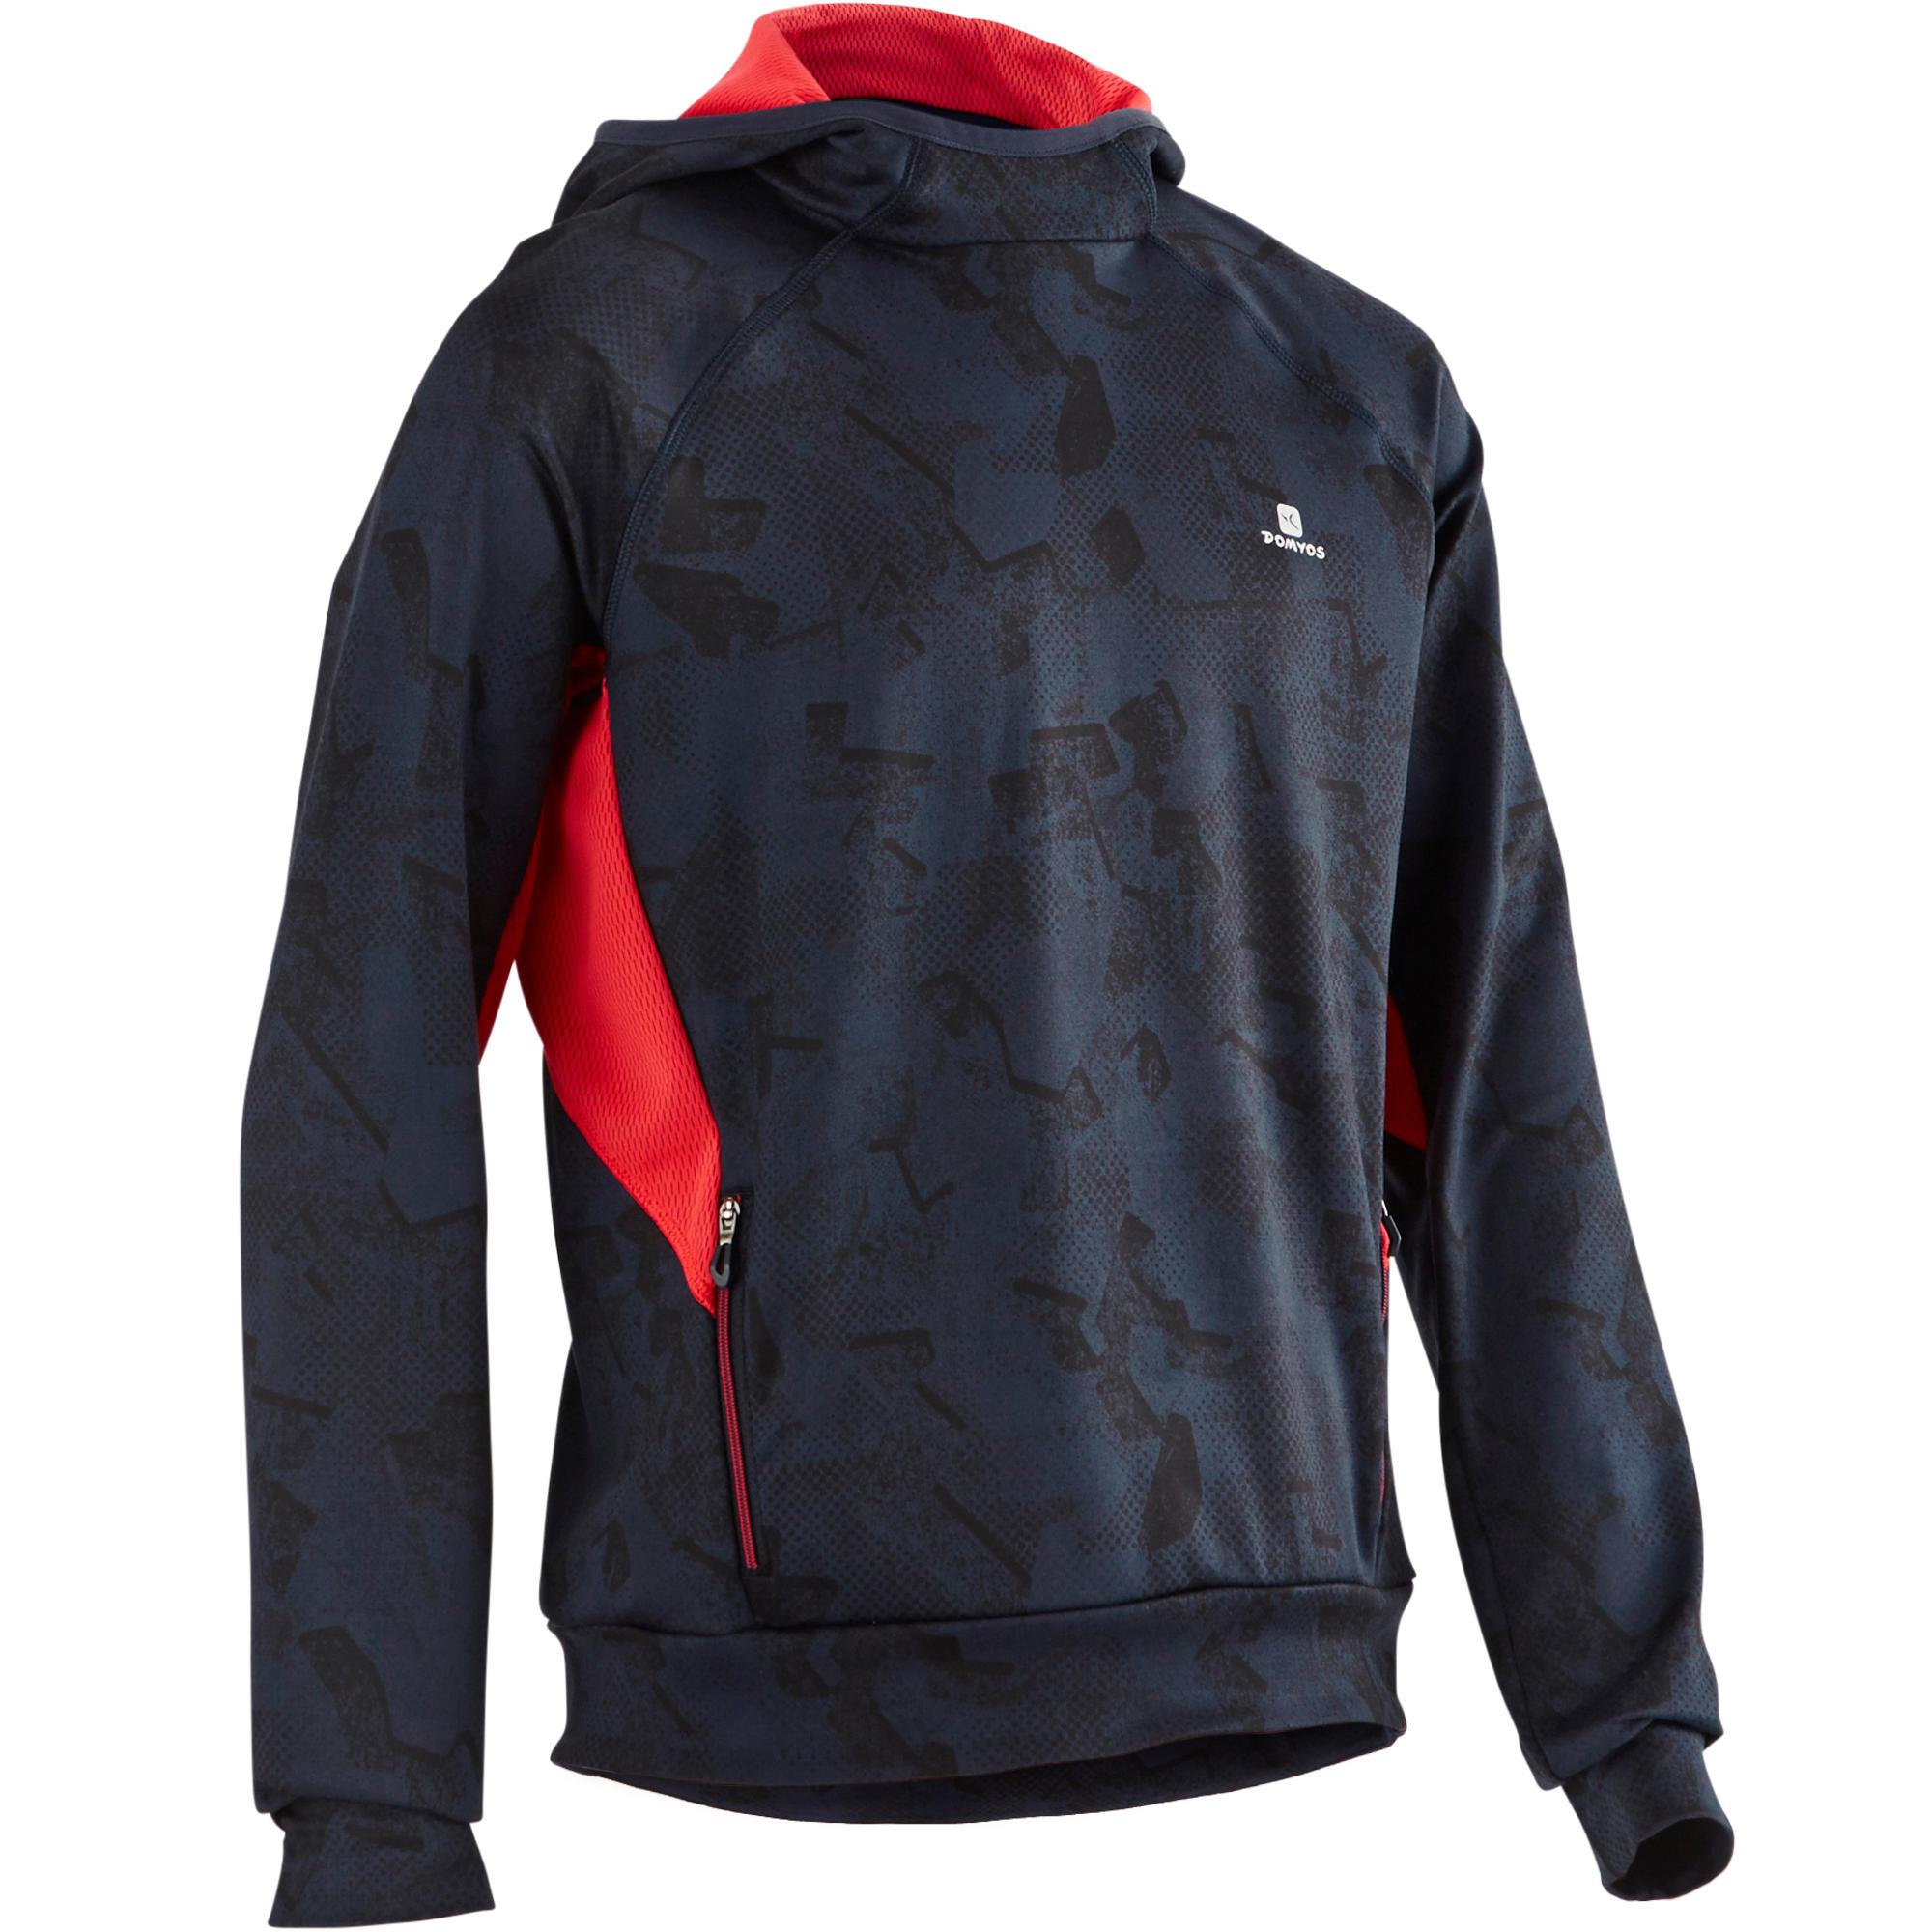 Chandail à capuche S900 Gym garçon bleu rouge